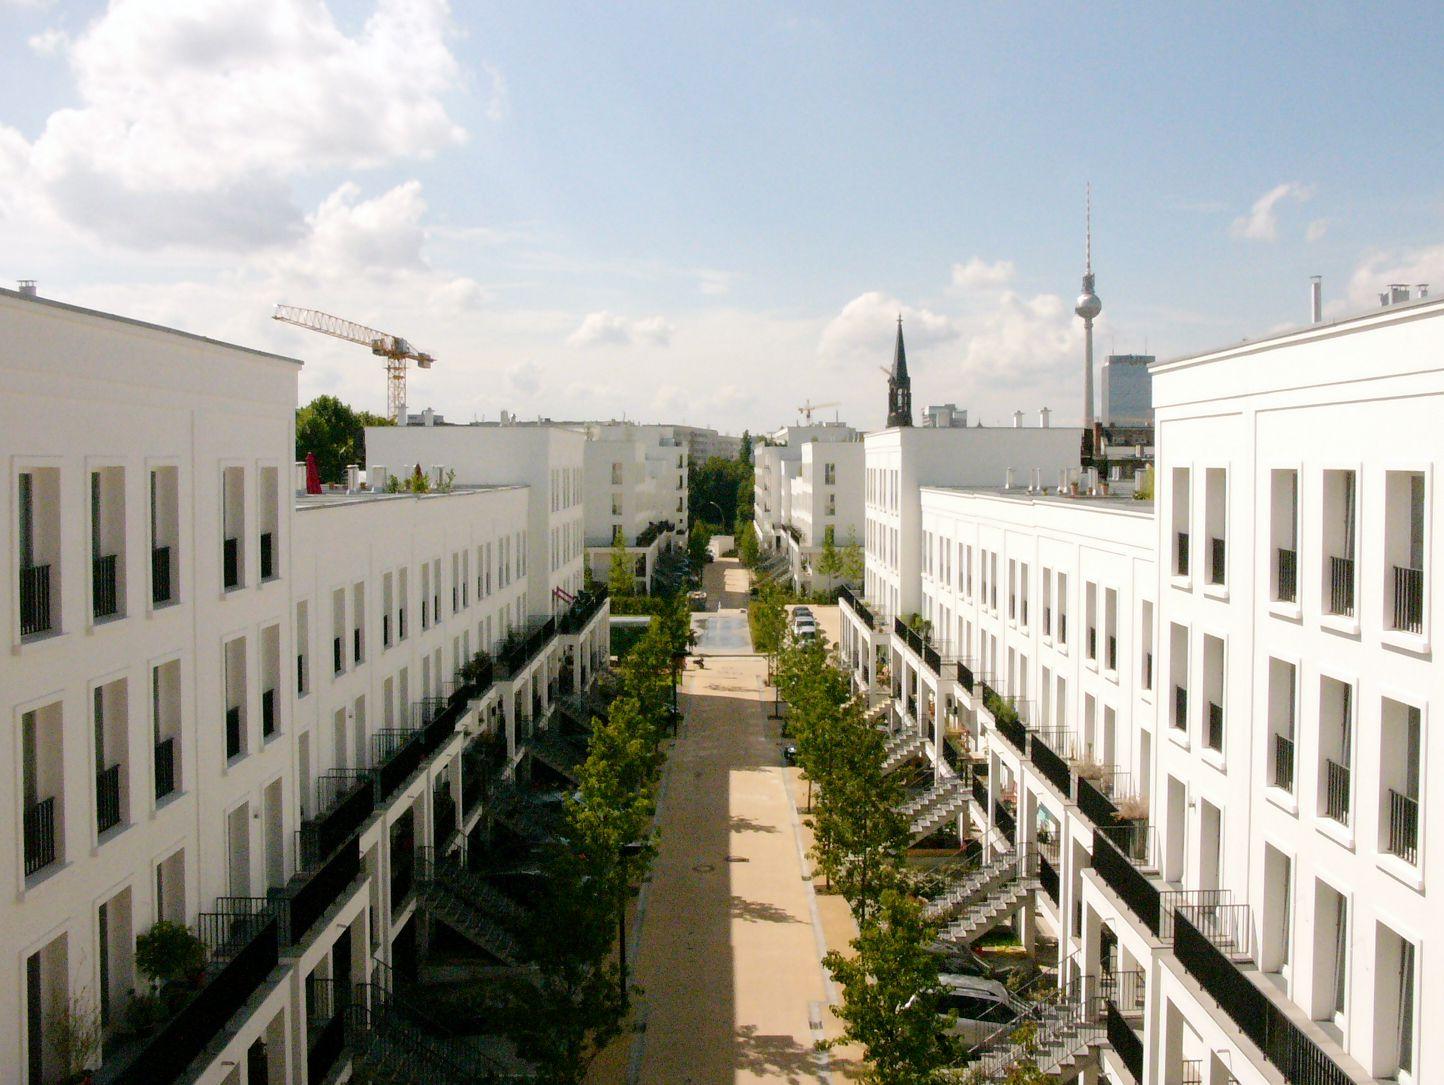 townhouse quartier prenzlauer g rten in berlin. Black Bedroom Furniture Sets. Home Design Ideas